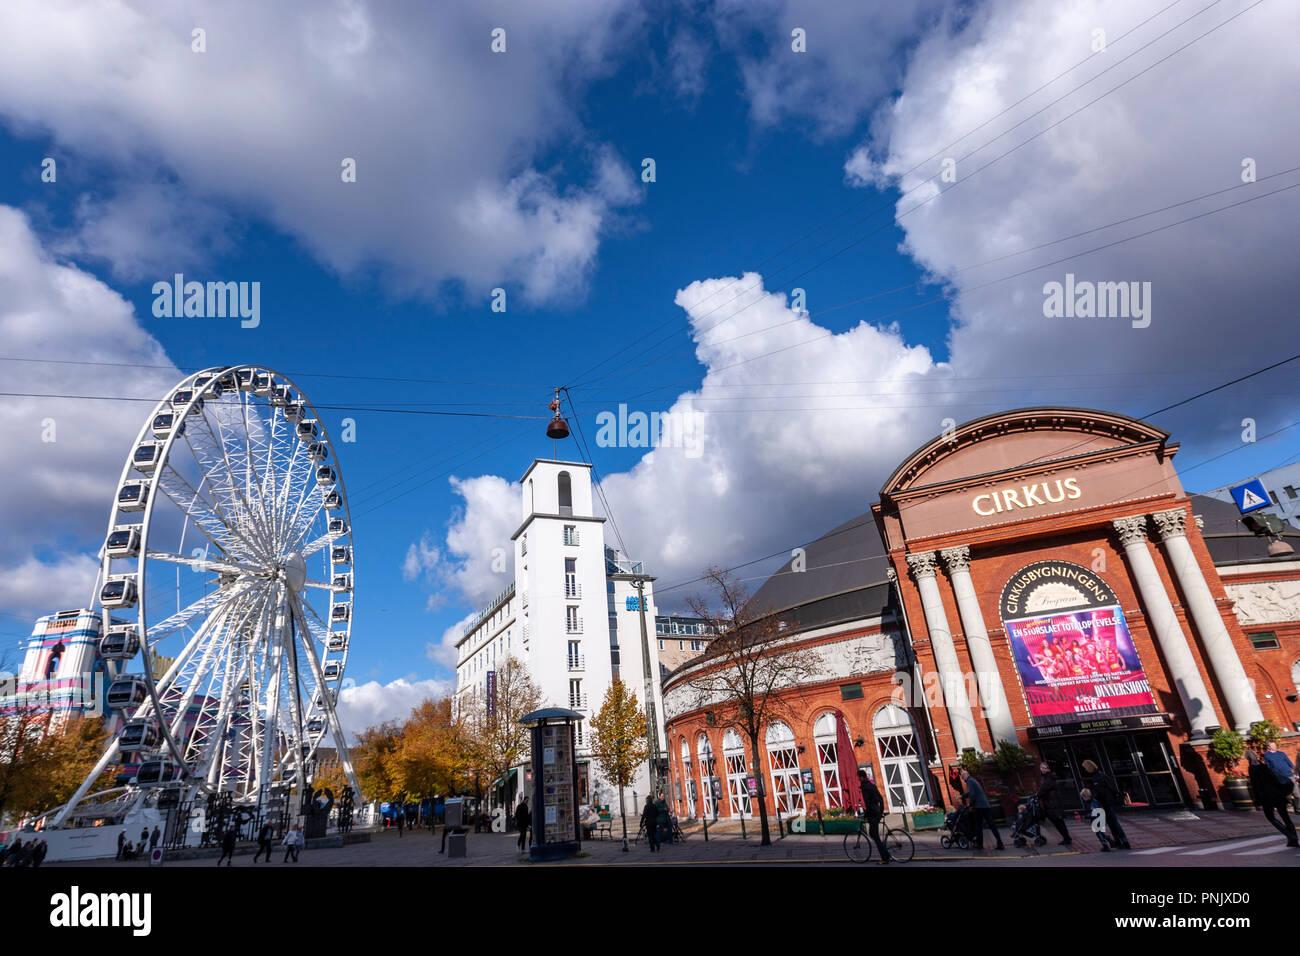 Circus Building and the Ferris wheel in Tivoli, Copenhagen, Denmark Stock Photo